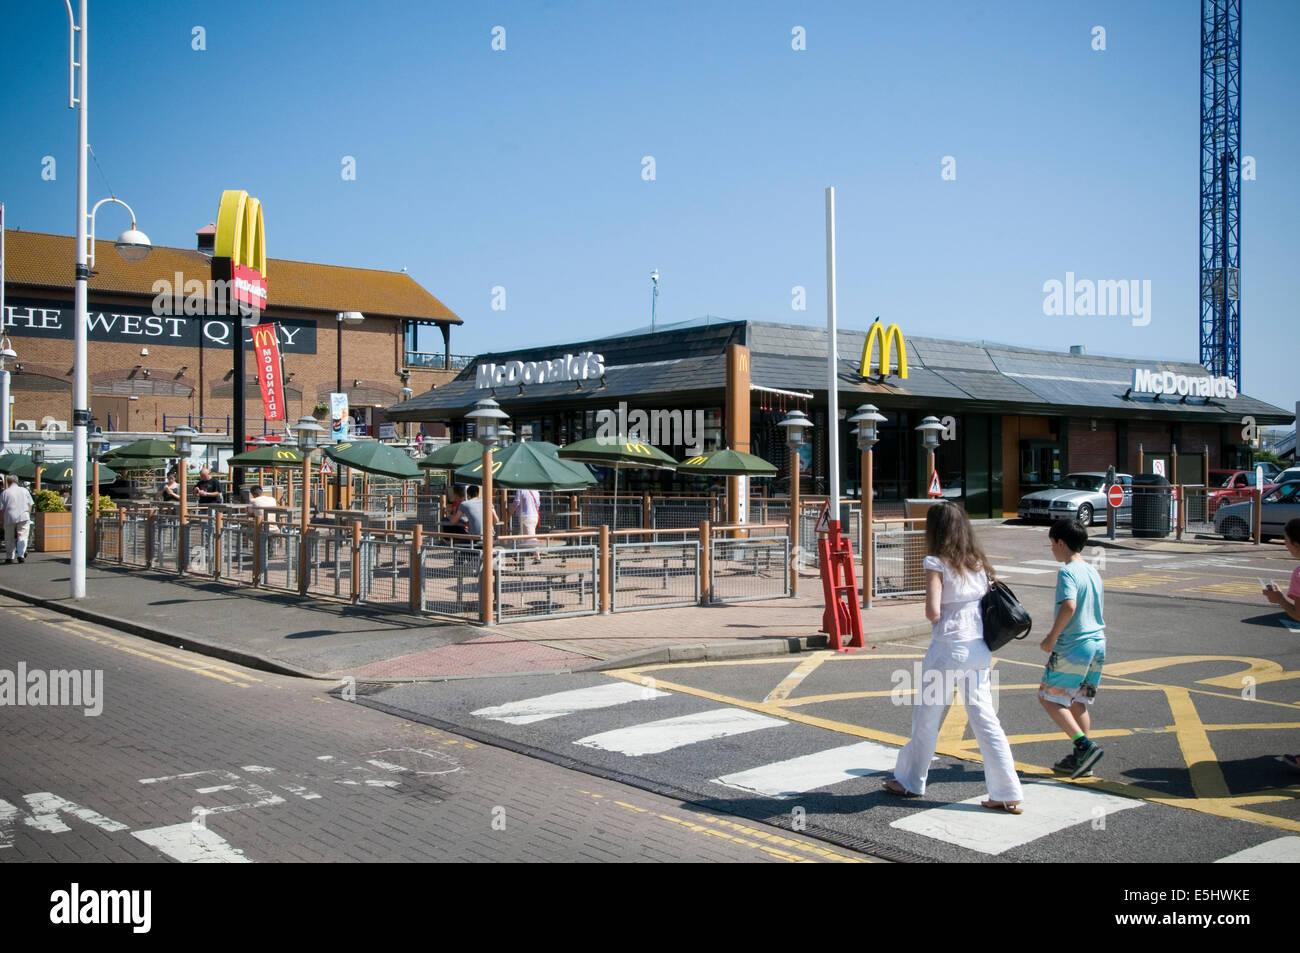 Mcdonalds Macdonalds Drive Through Thru Restaurant Restaurants